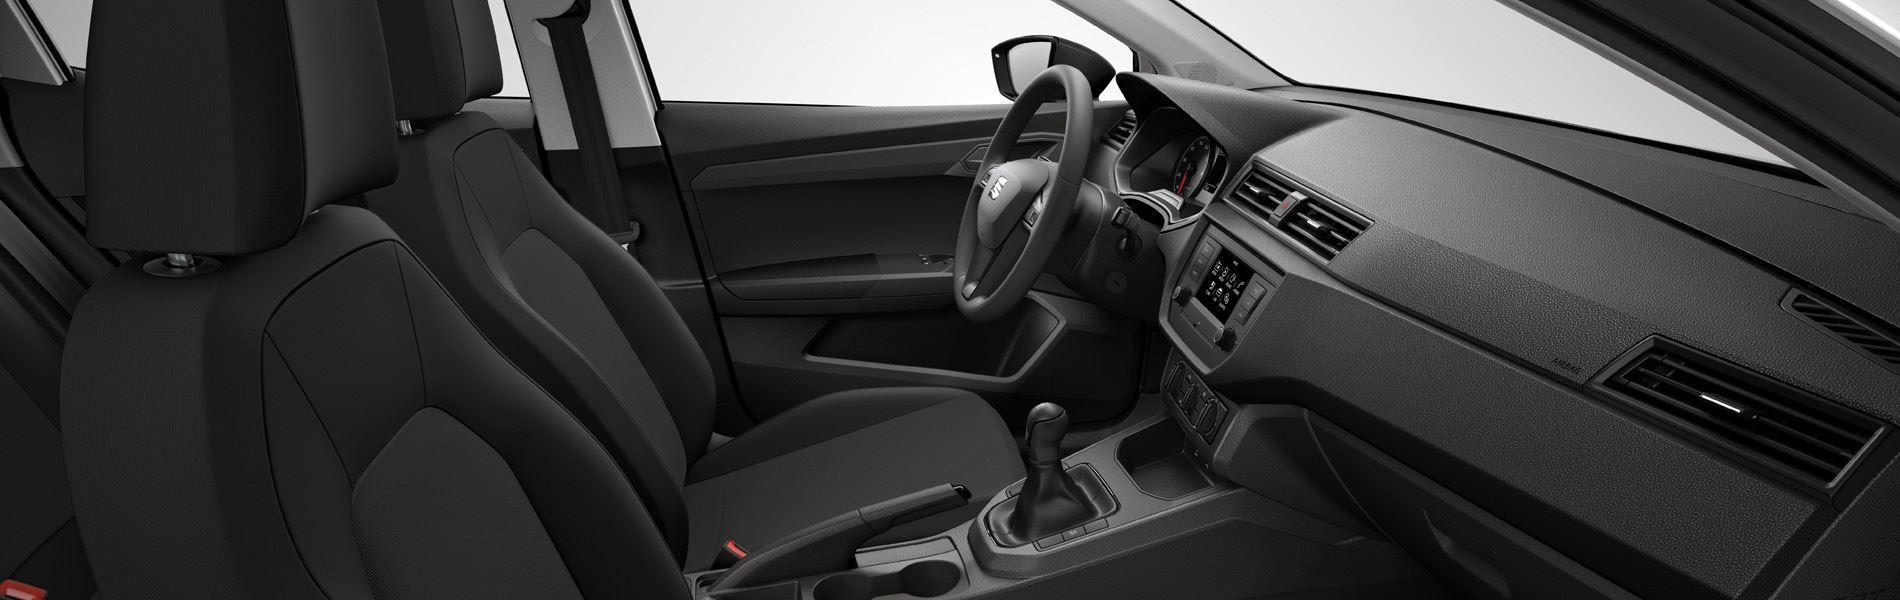 https://www.ames.nl/media/2058/seat-ibiza-interieur.jpg?mode=pad&rnd=131701599360000000